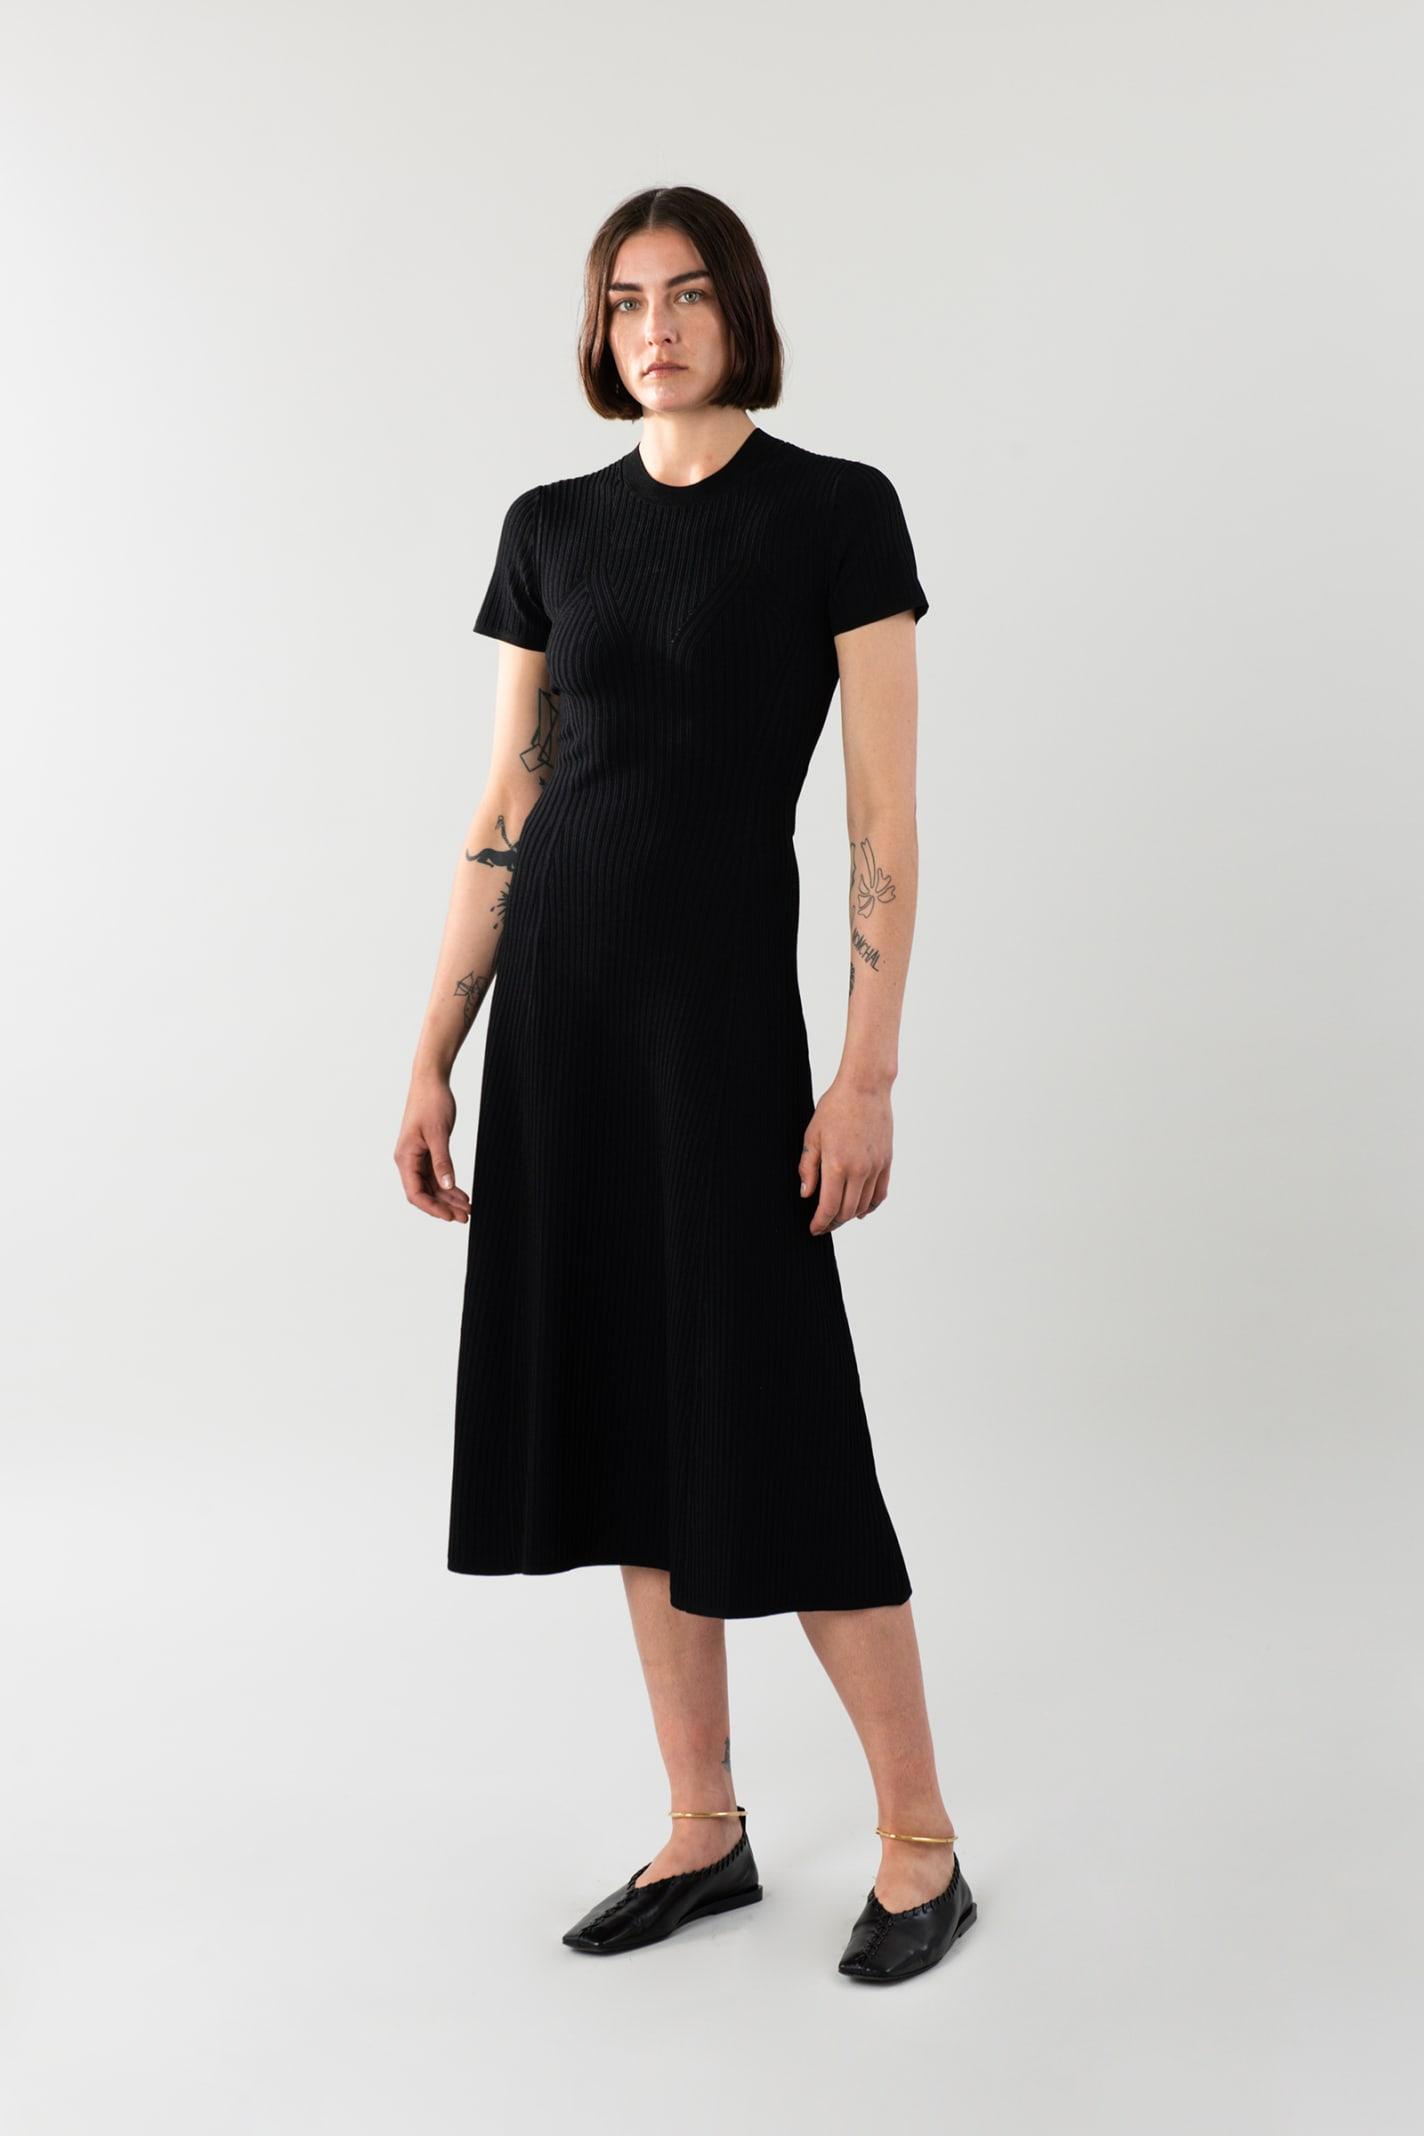 Proenza Schouler White Label Clothing KNIT DRESS